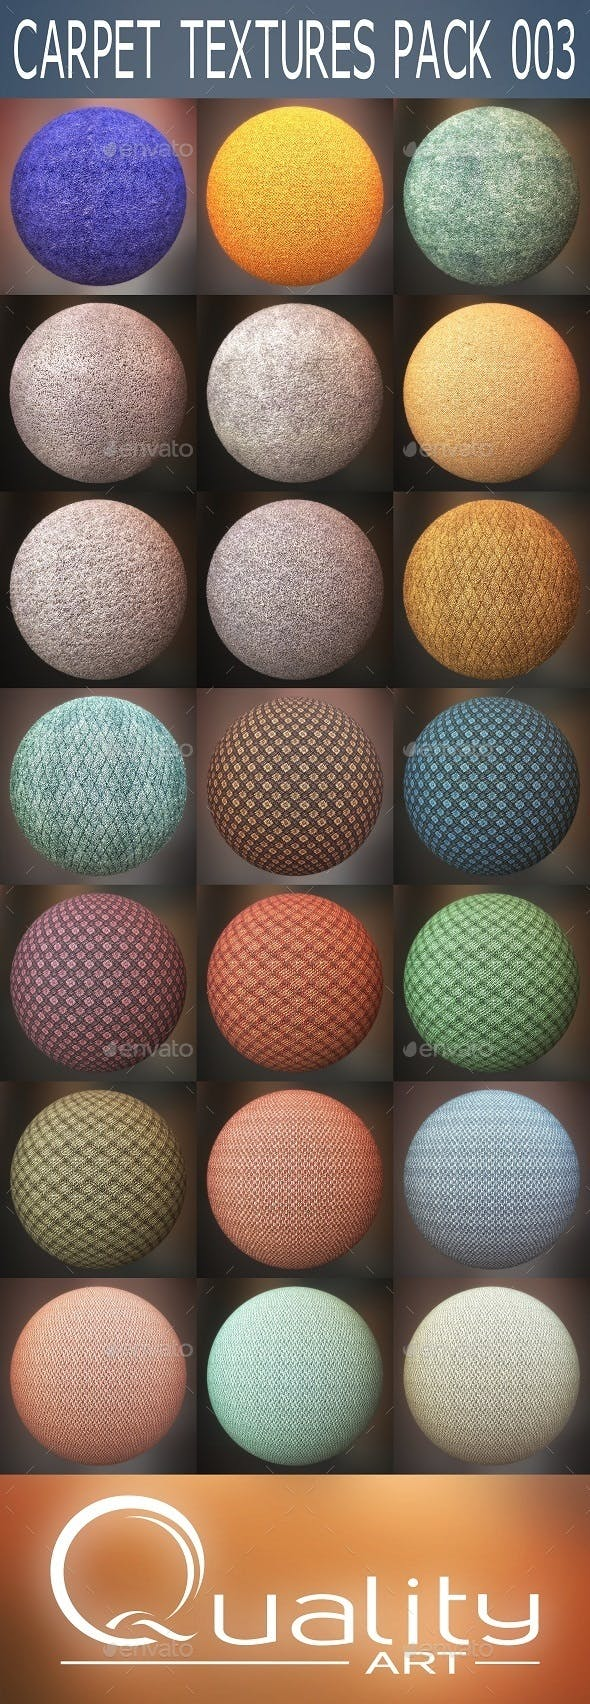 Carpet Textures Pack 003 - 3DOcean Item for Sale